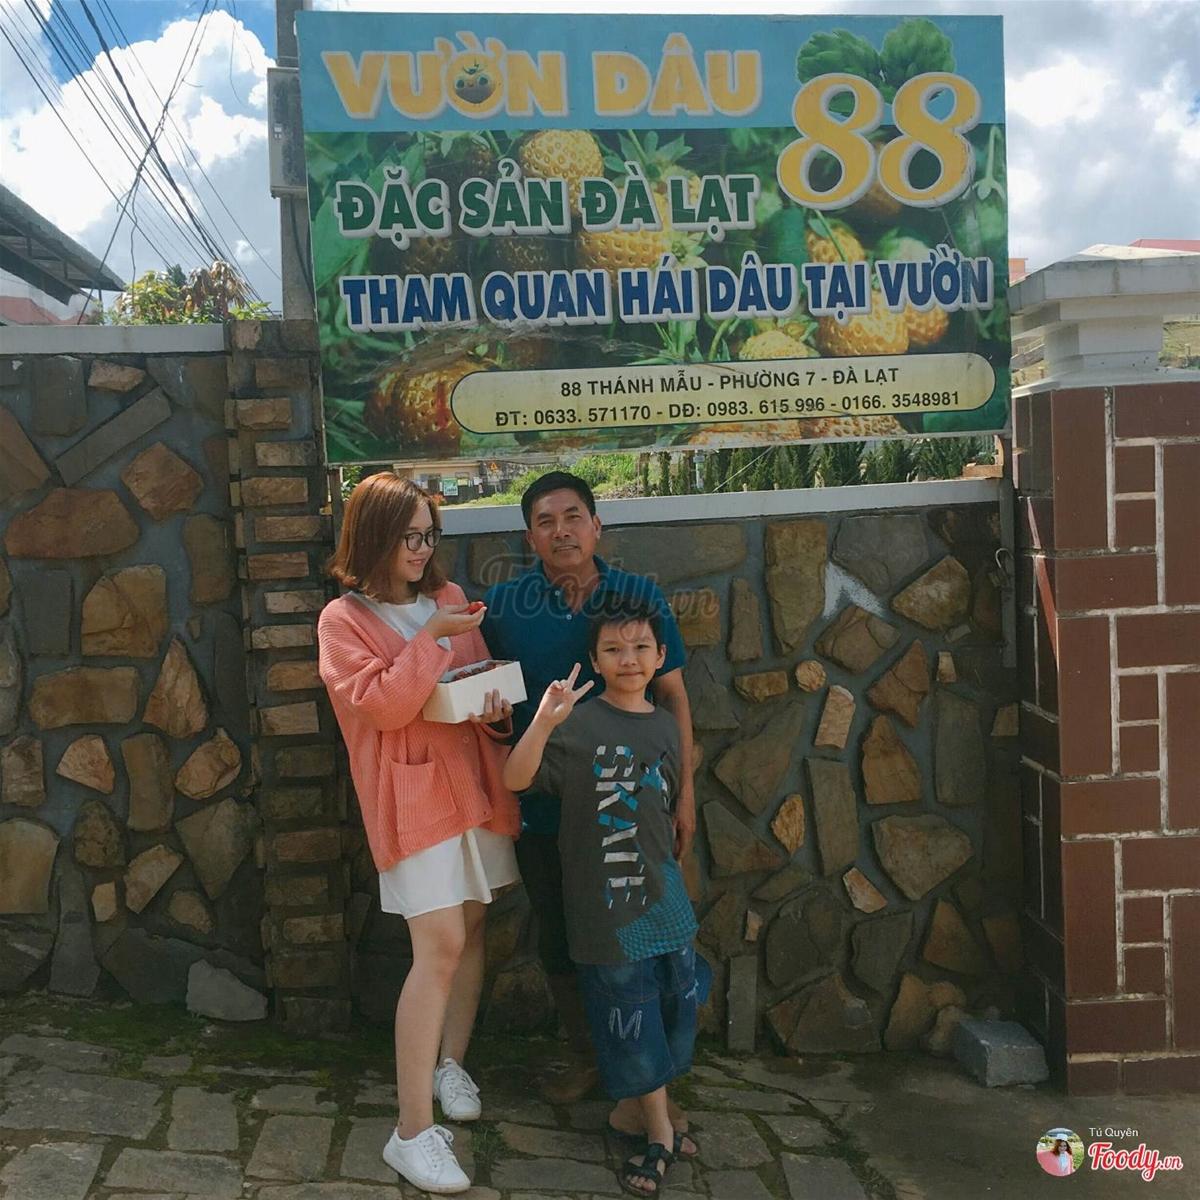 phat-cuong-truoc-5-trang-trai-ngon-doc-la-de-ban-song-ao-o-da-lat-9